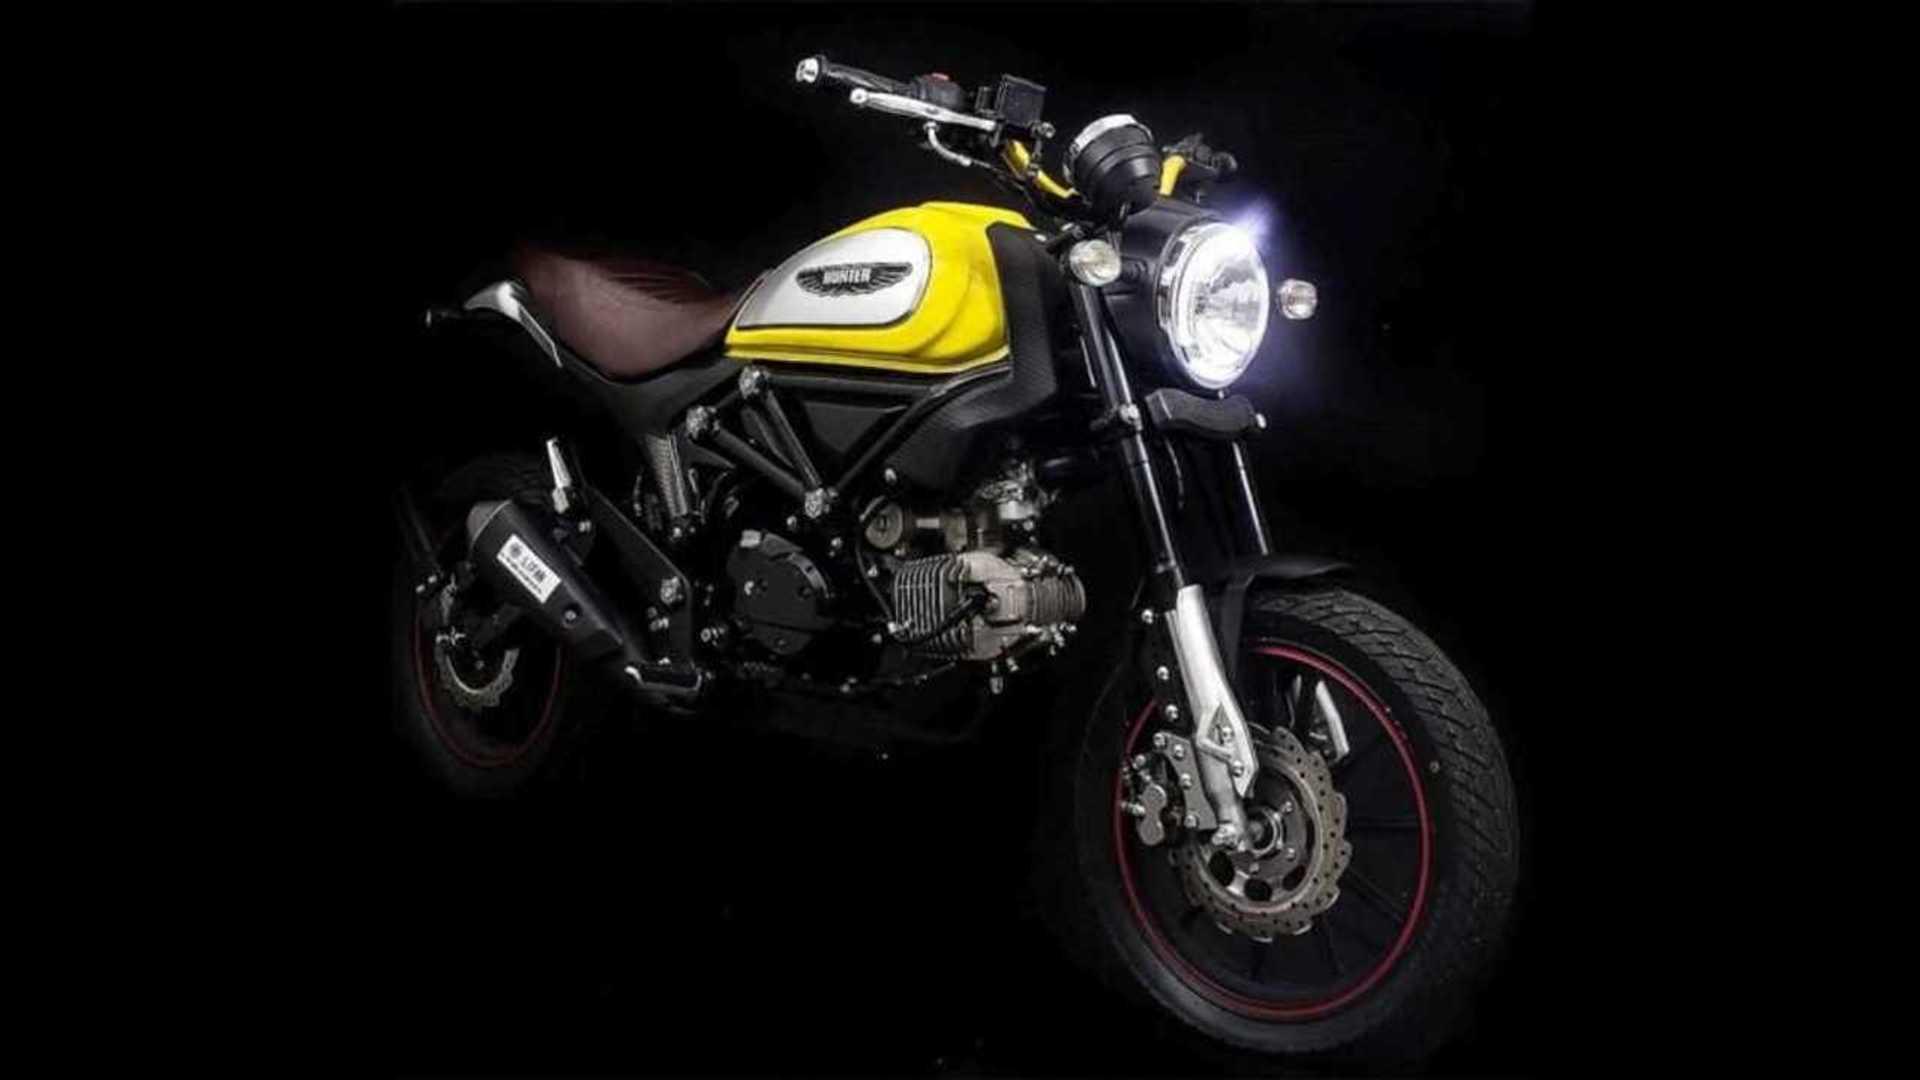 Lifan Hunter 125 Blatantly Rips Off Ducati Scrambler's Styling